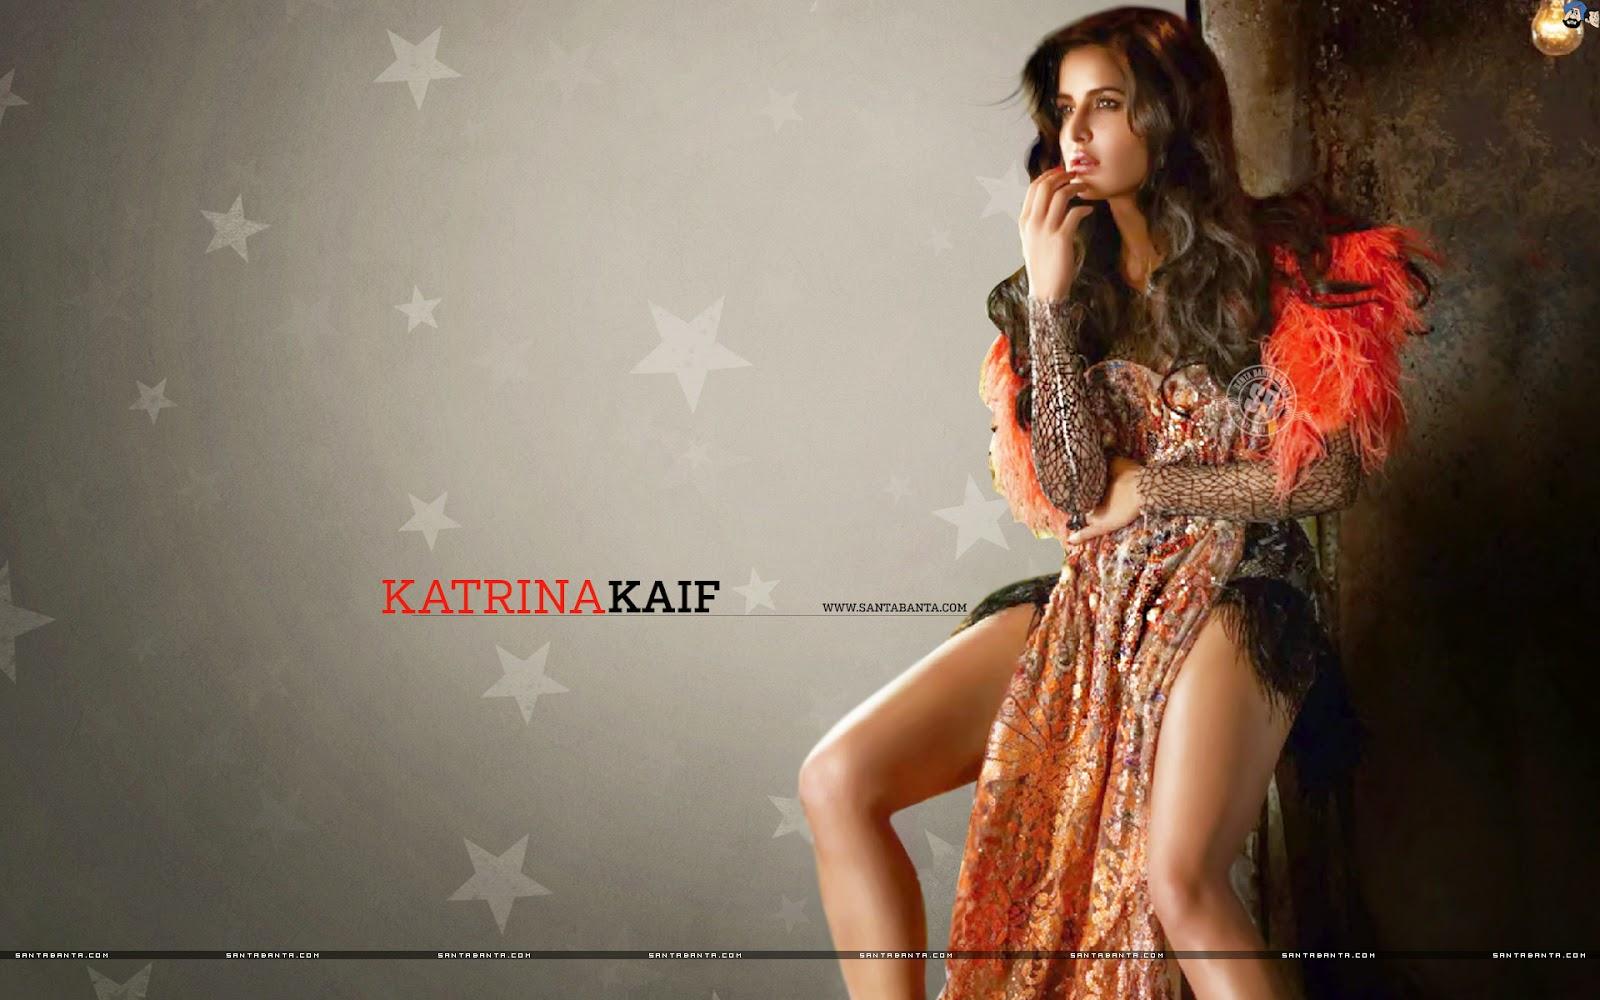 Katrina Kaif Seksi Wallpaper 2